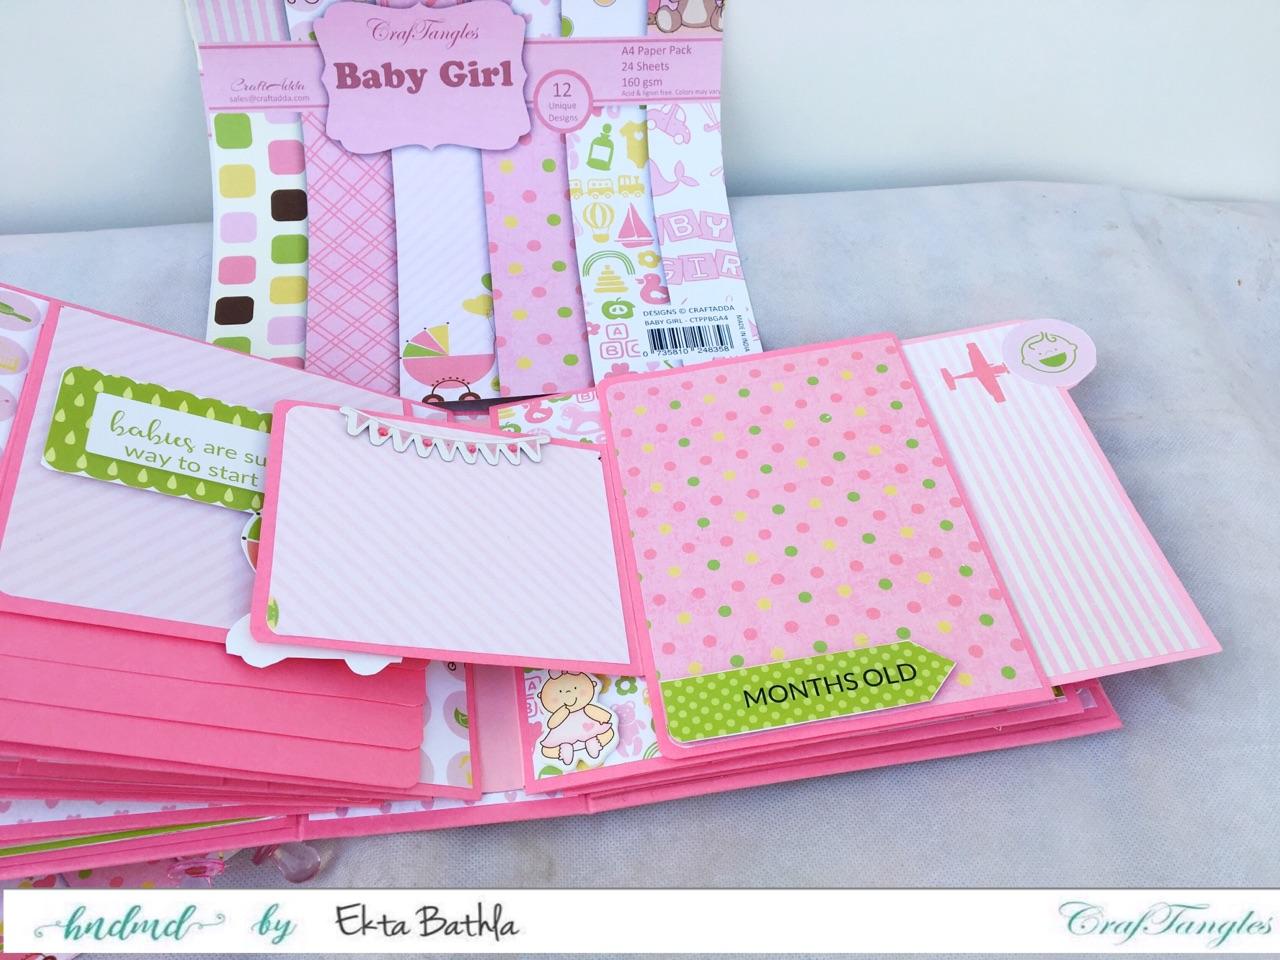 Baby Girl mini album showcasing Baby Girl Elements Pack by CrafTangles 8